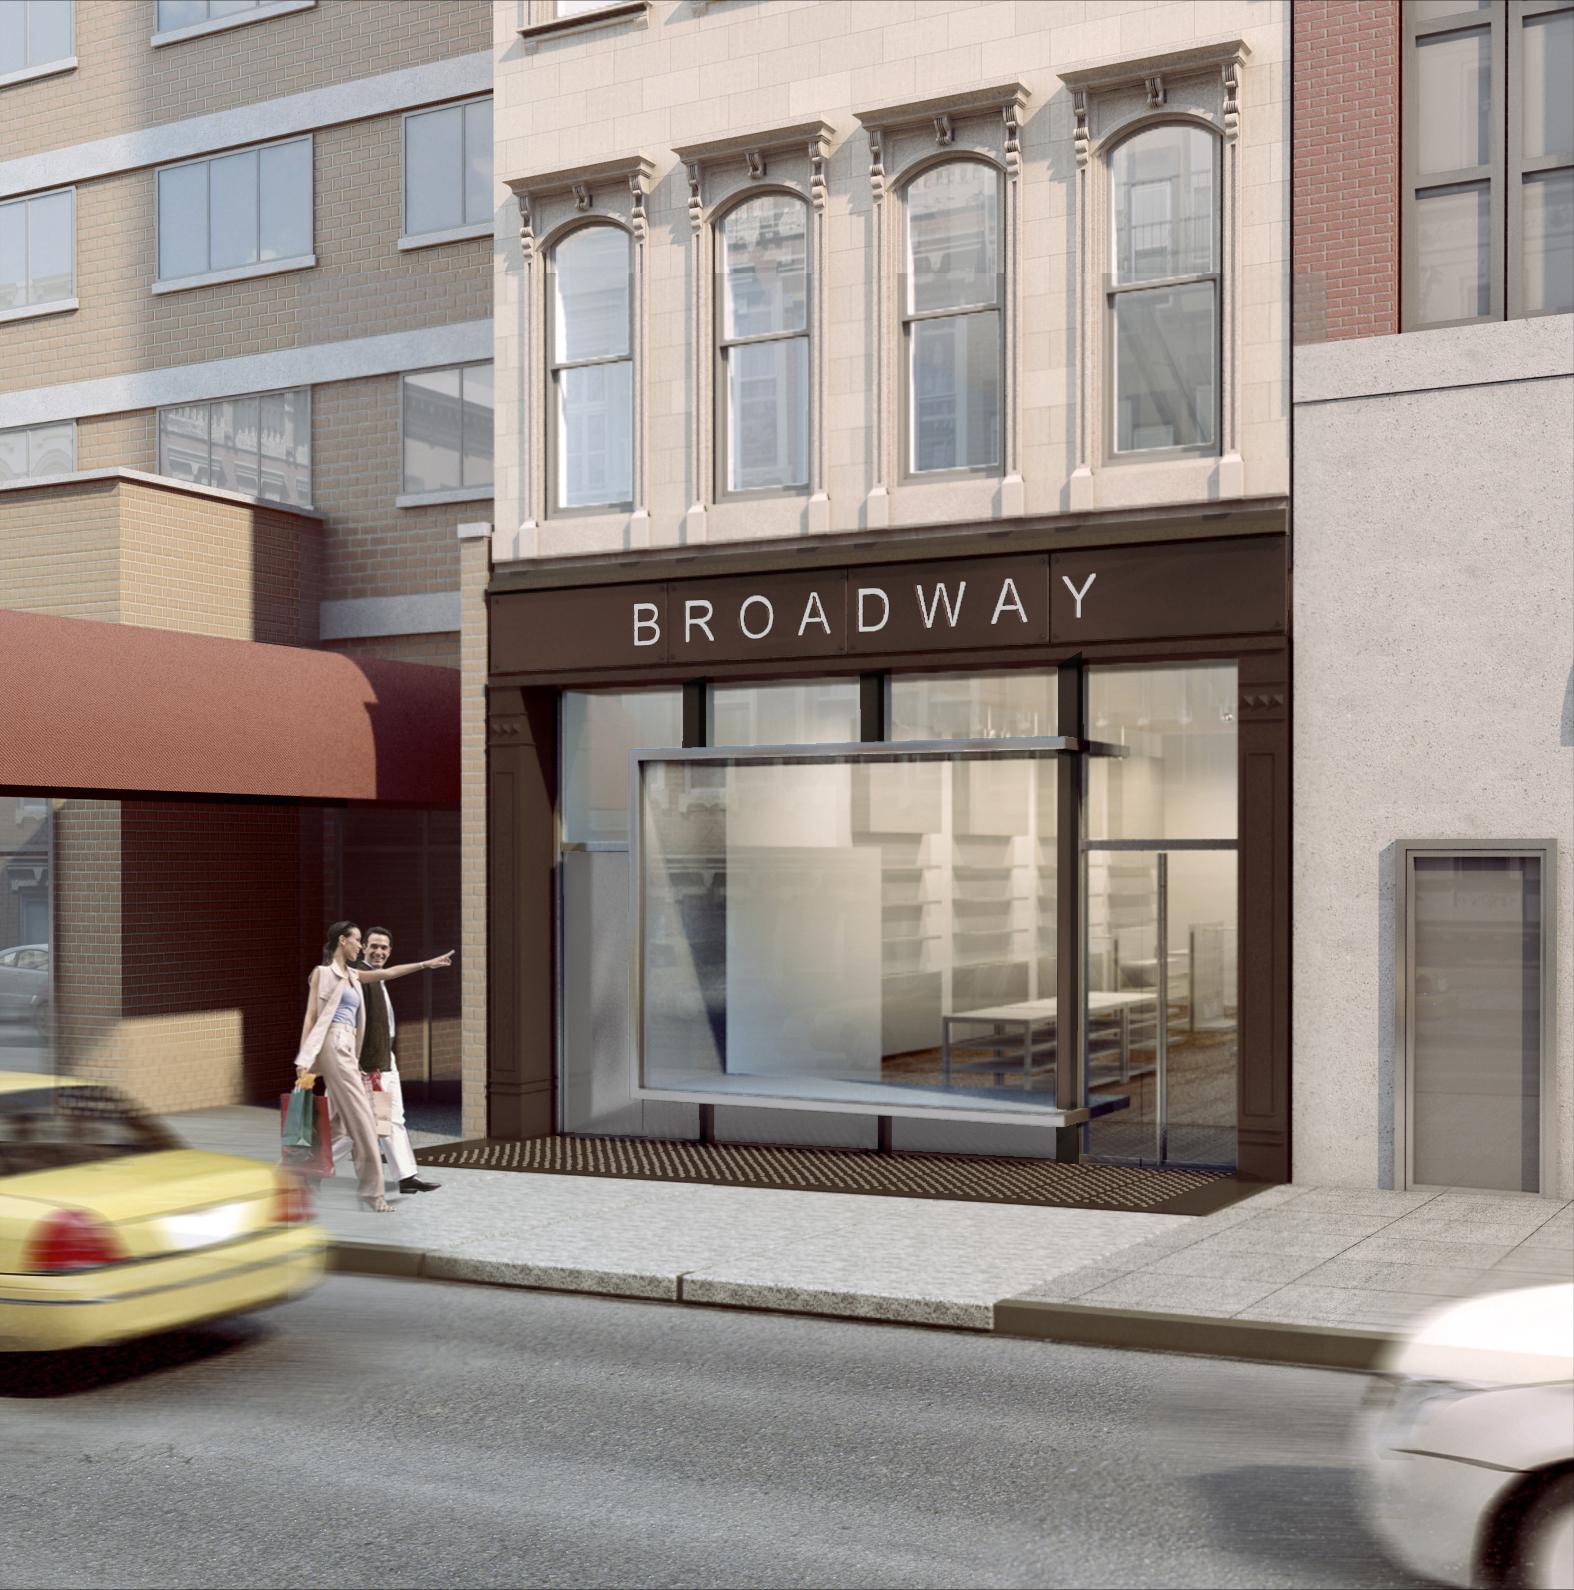 #TriBeCa    #SixCortlandtAlley  #construction    #facade    #preservation  #nycrealestate    #CondoConversion  #architecture